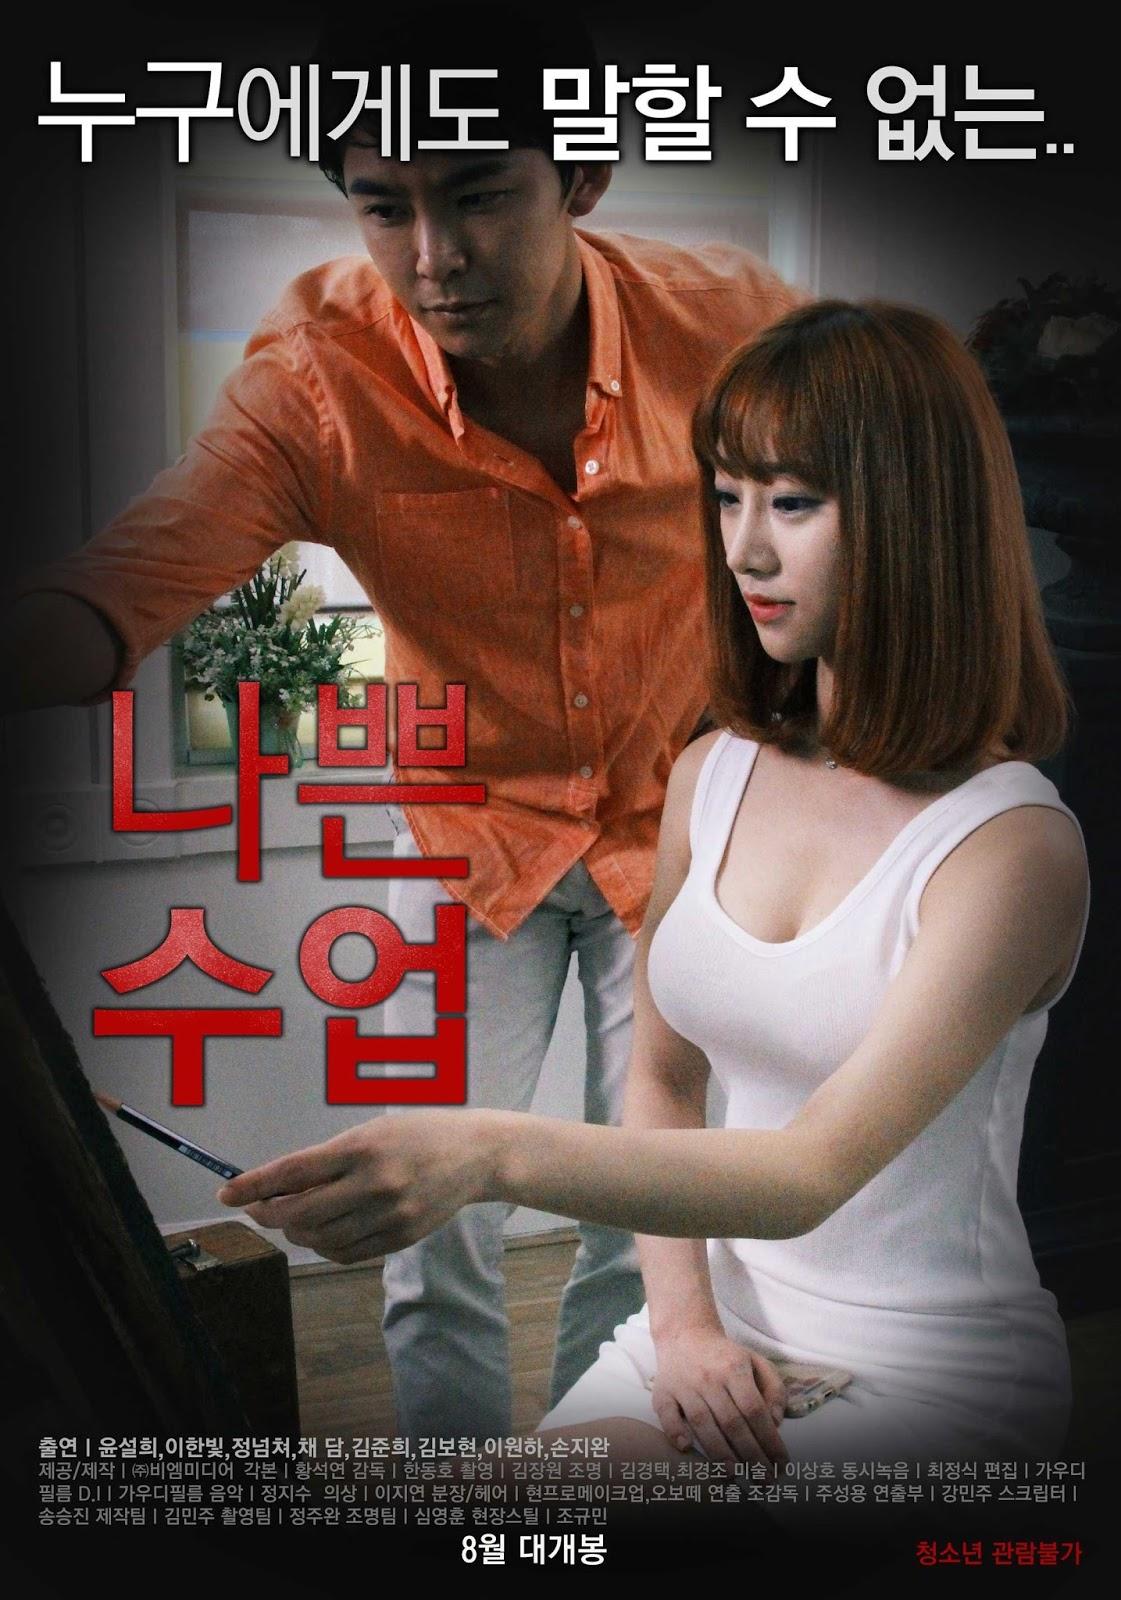 Download Film Bad Class (2016) DVDRip 720p Subtitle Indonesia | Free